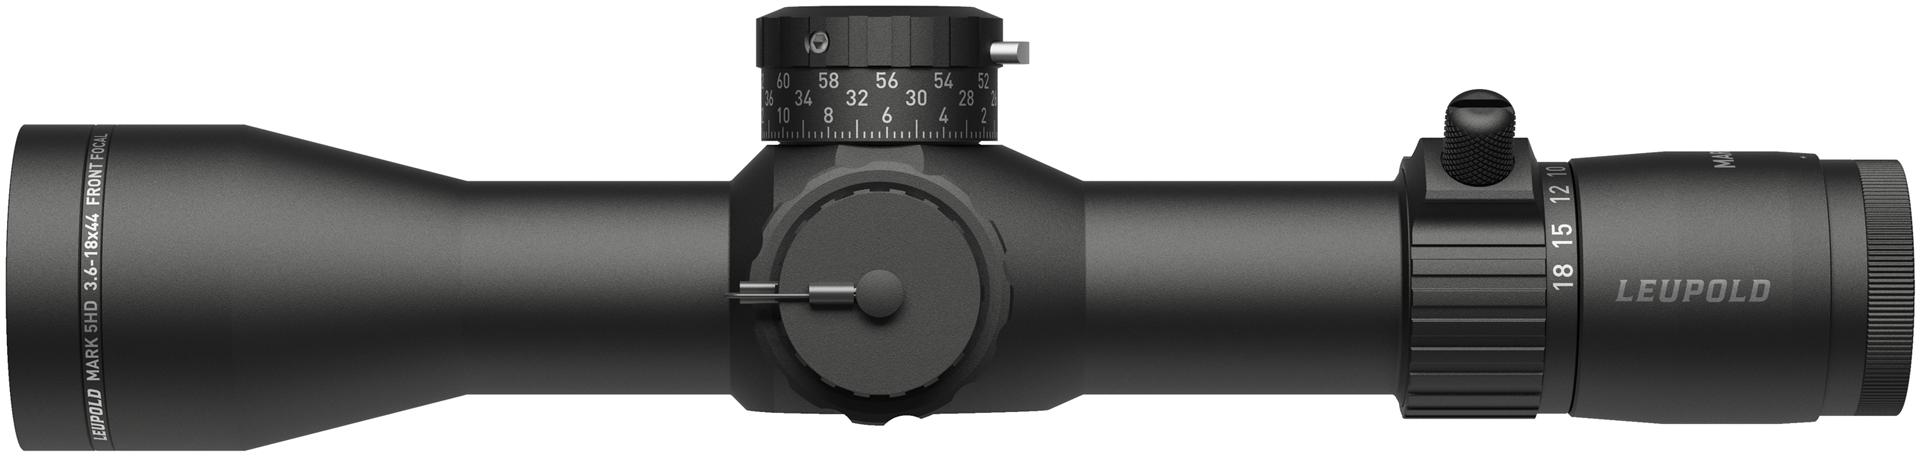 3.6-18x44mm